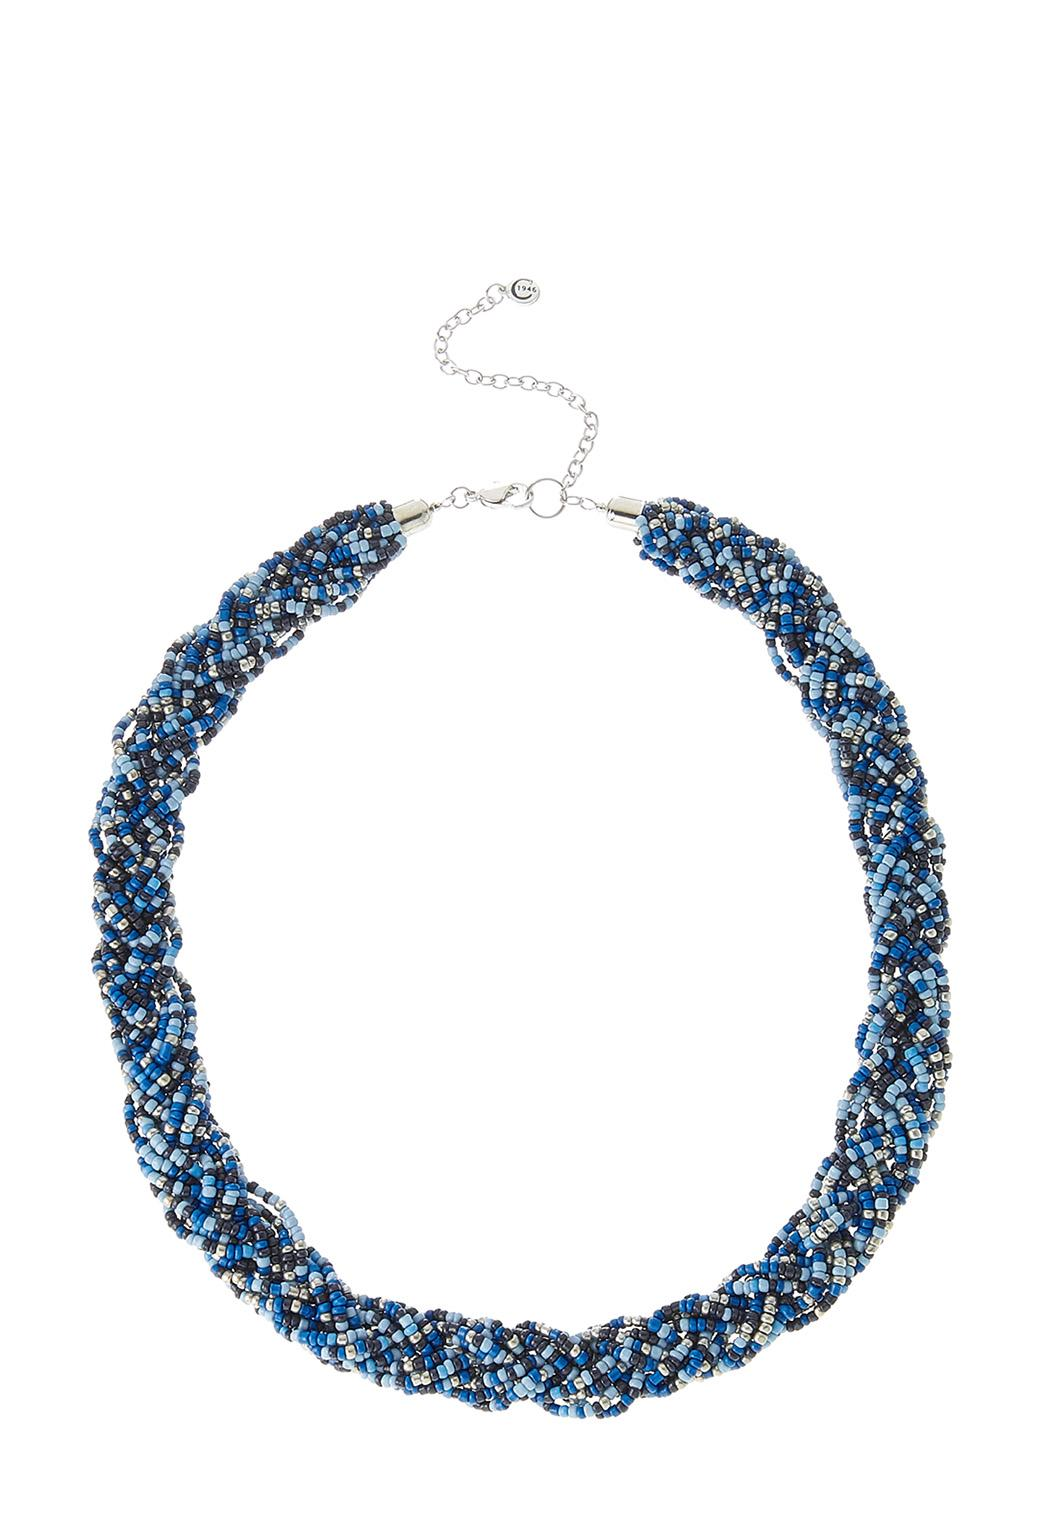 Braided Seed Bead Bracelet